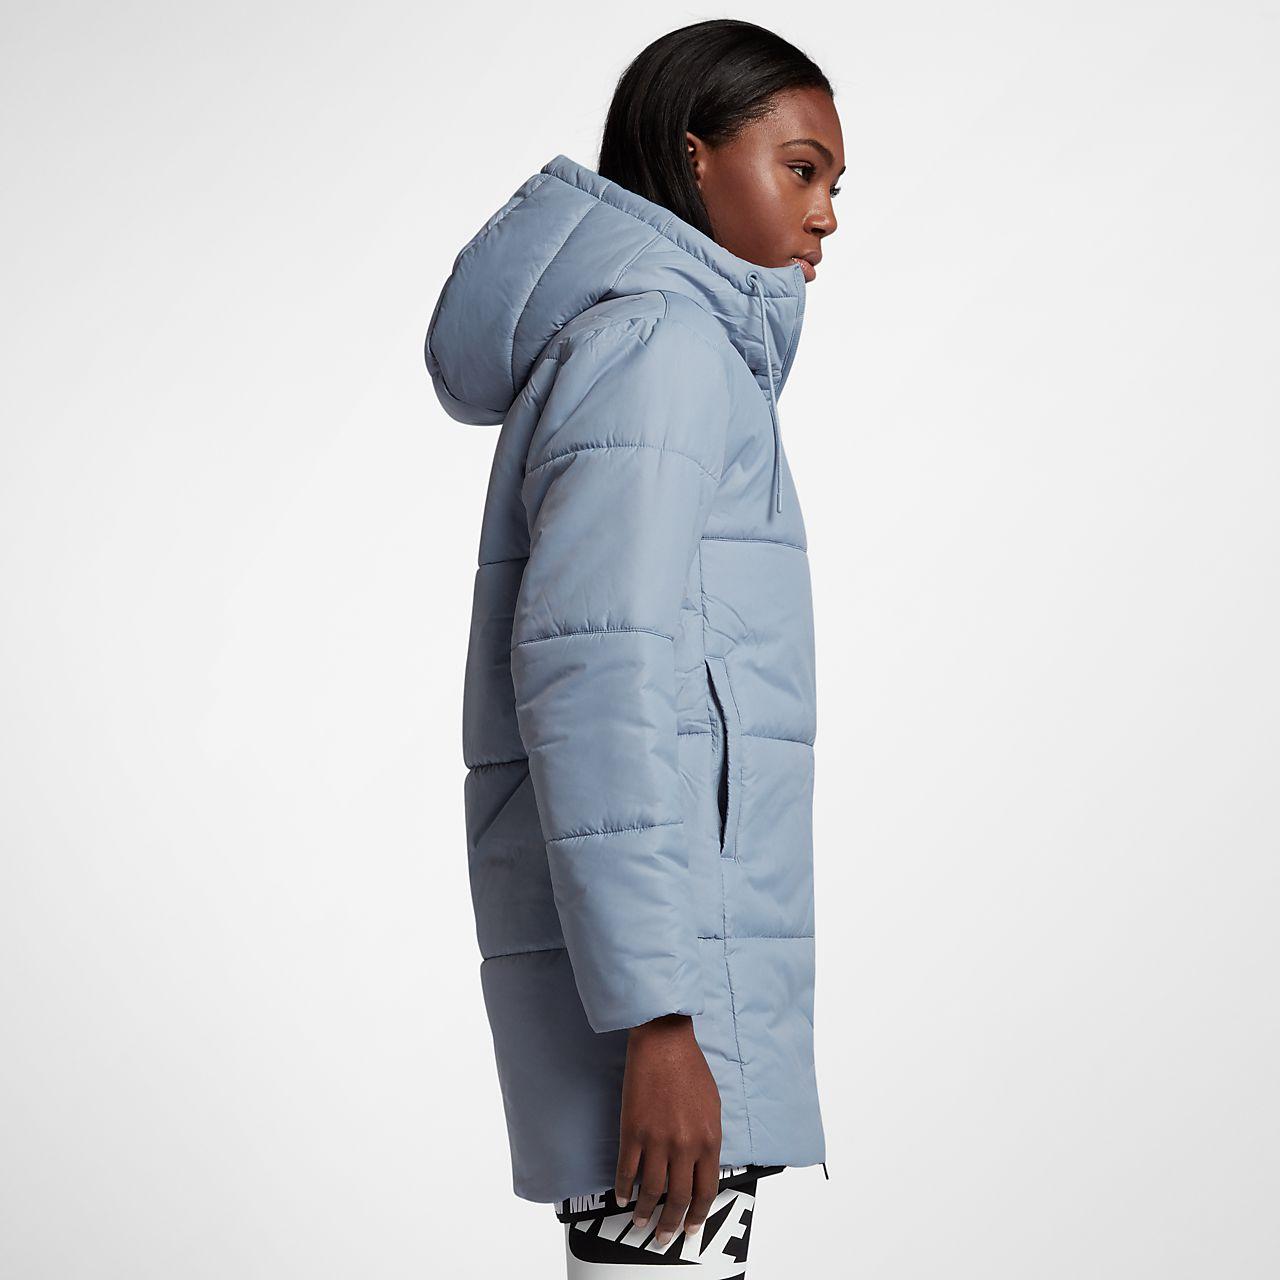 347 Femme Bonded Parka 804031 Femme nike Pour Nike Sportswear ASq5RL34cj